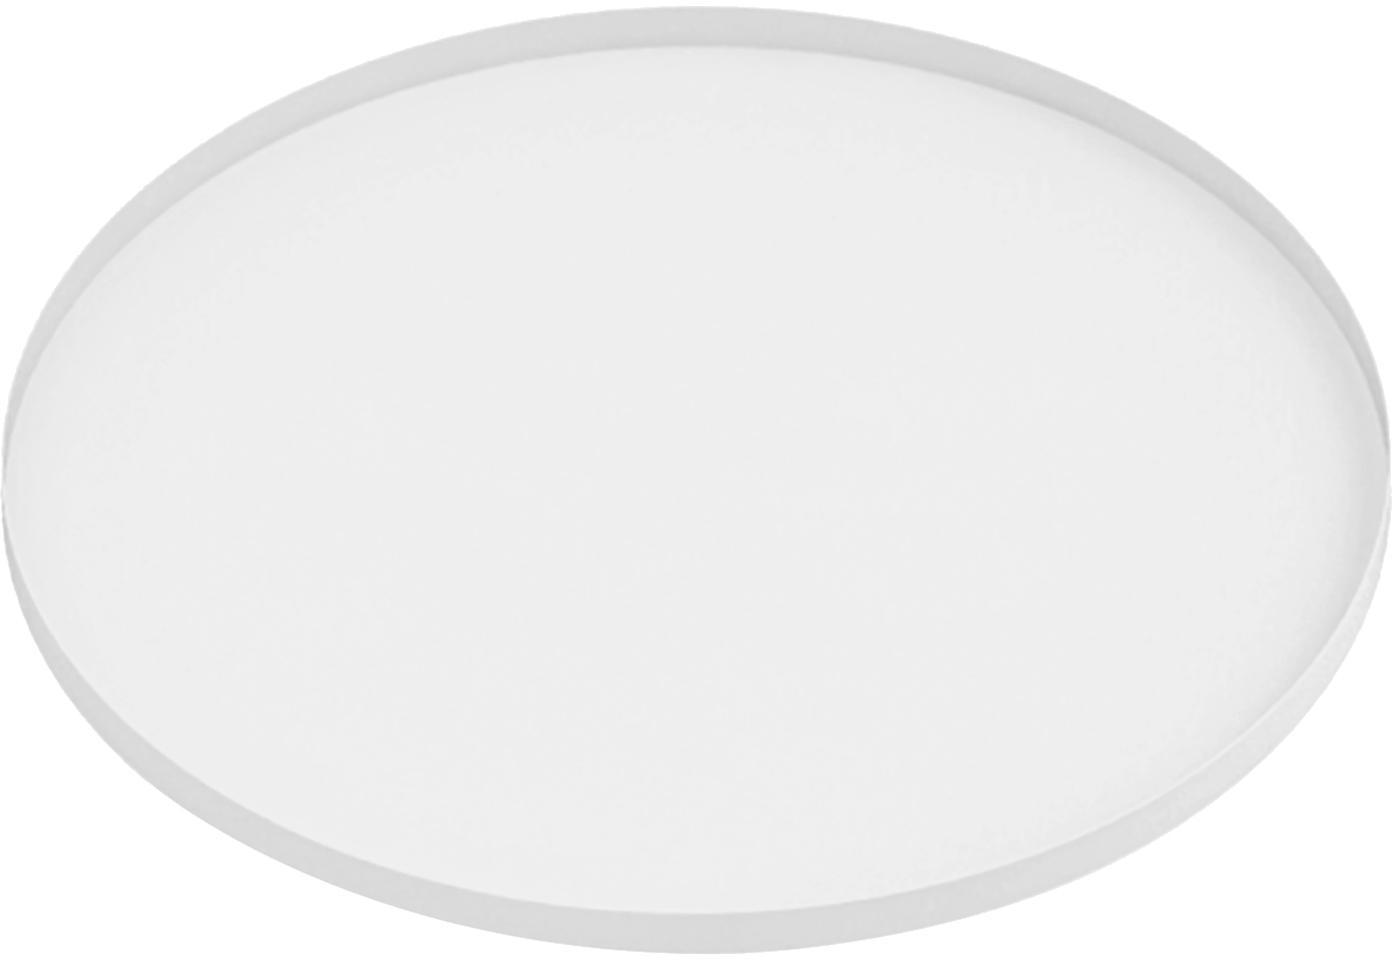 Dienblad Arla, Gecoat metaal, Wit, Ø 41 cm